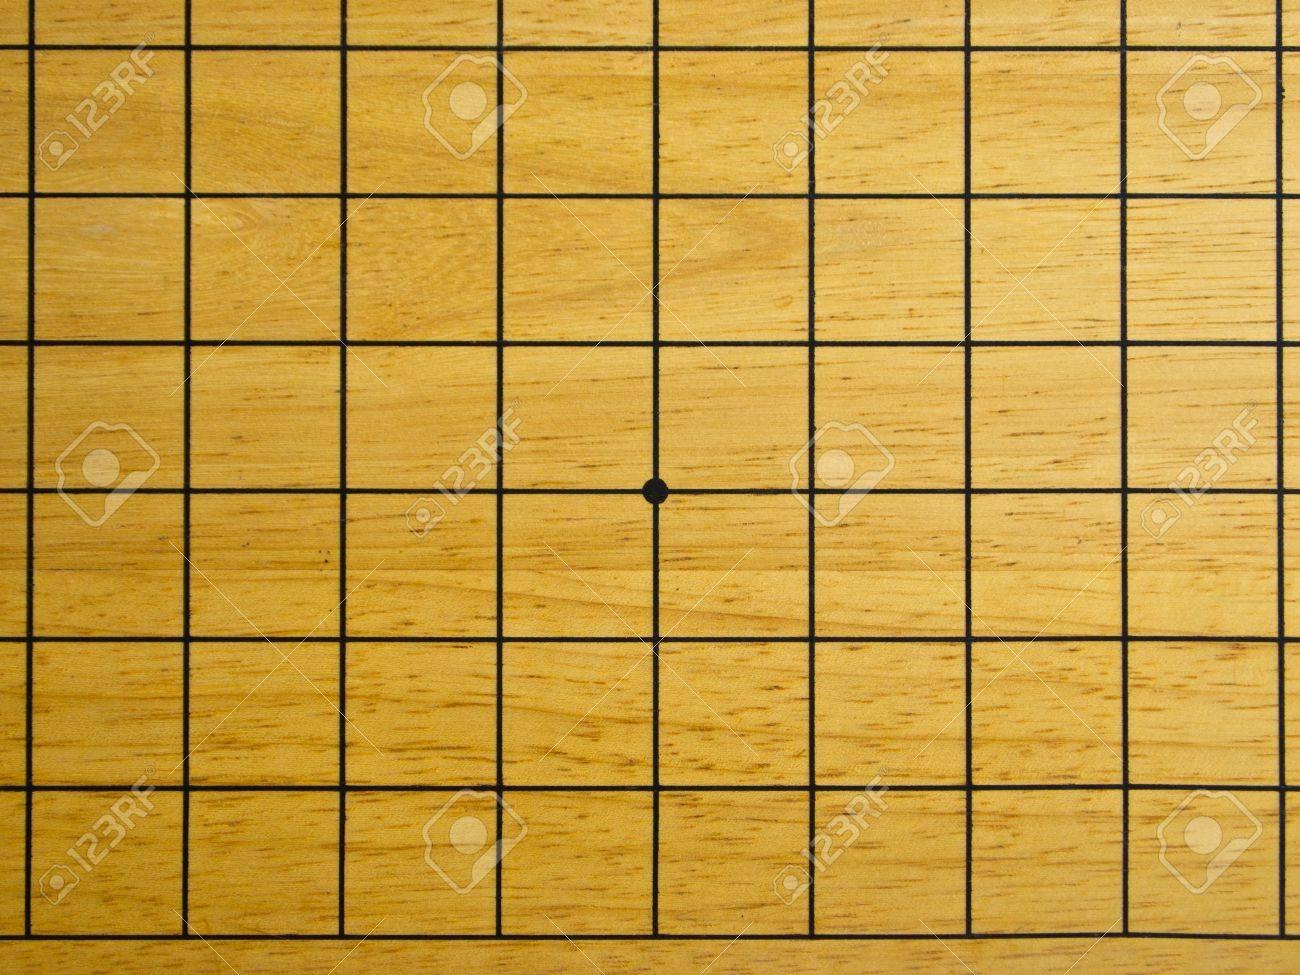 Grid Go Game Board Stock Photo